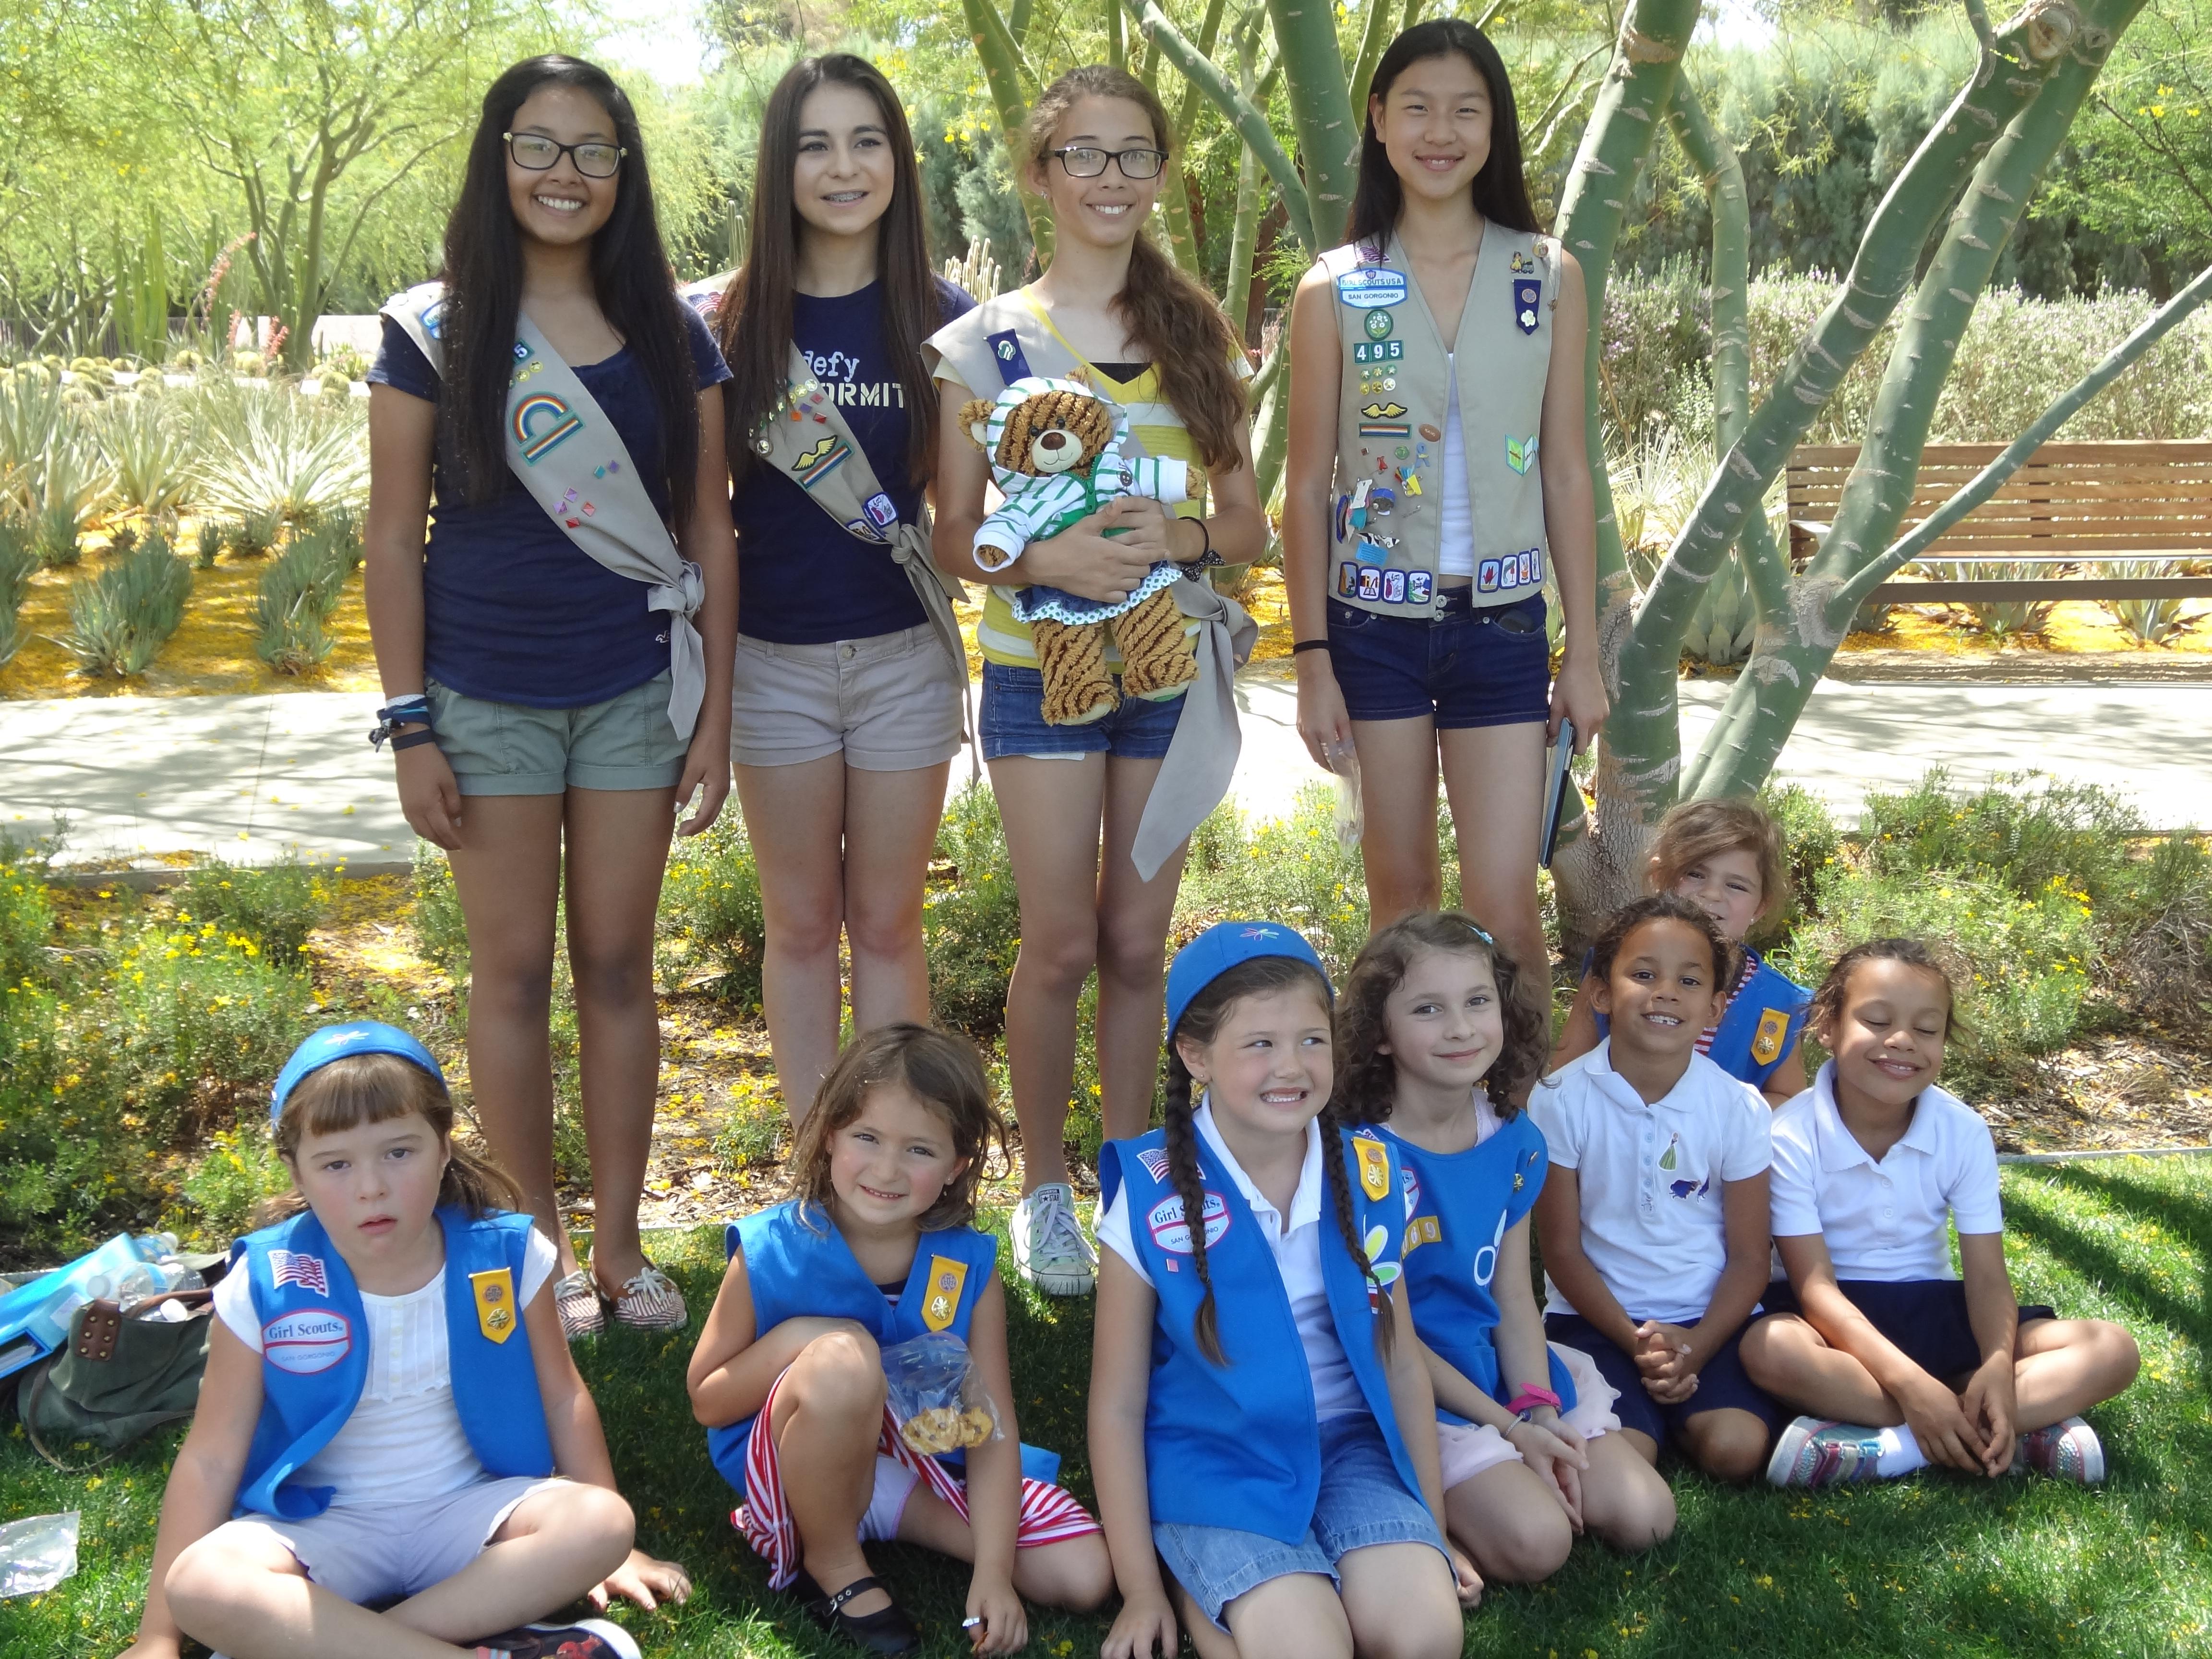 daisy super troop 4069 visits sunnyland with older girl